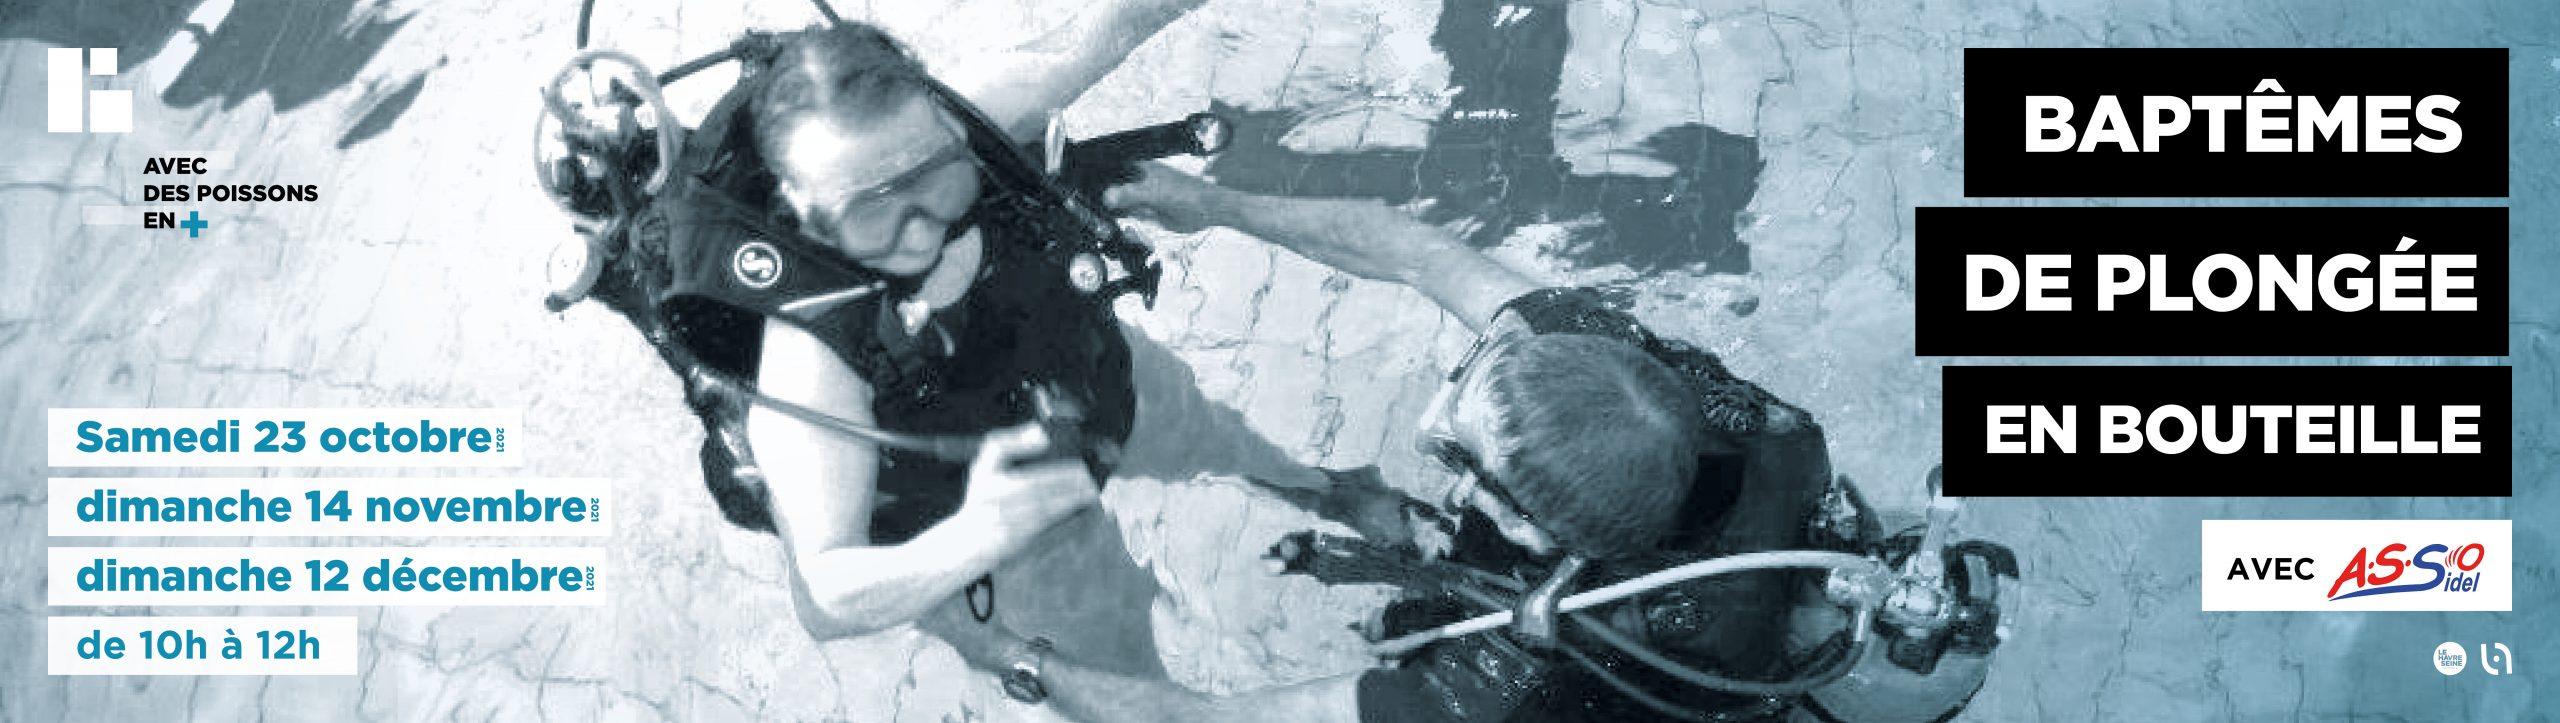 Baptêmes de plongée